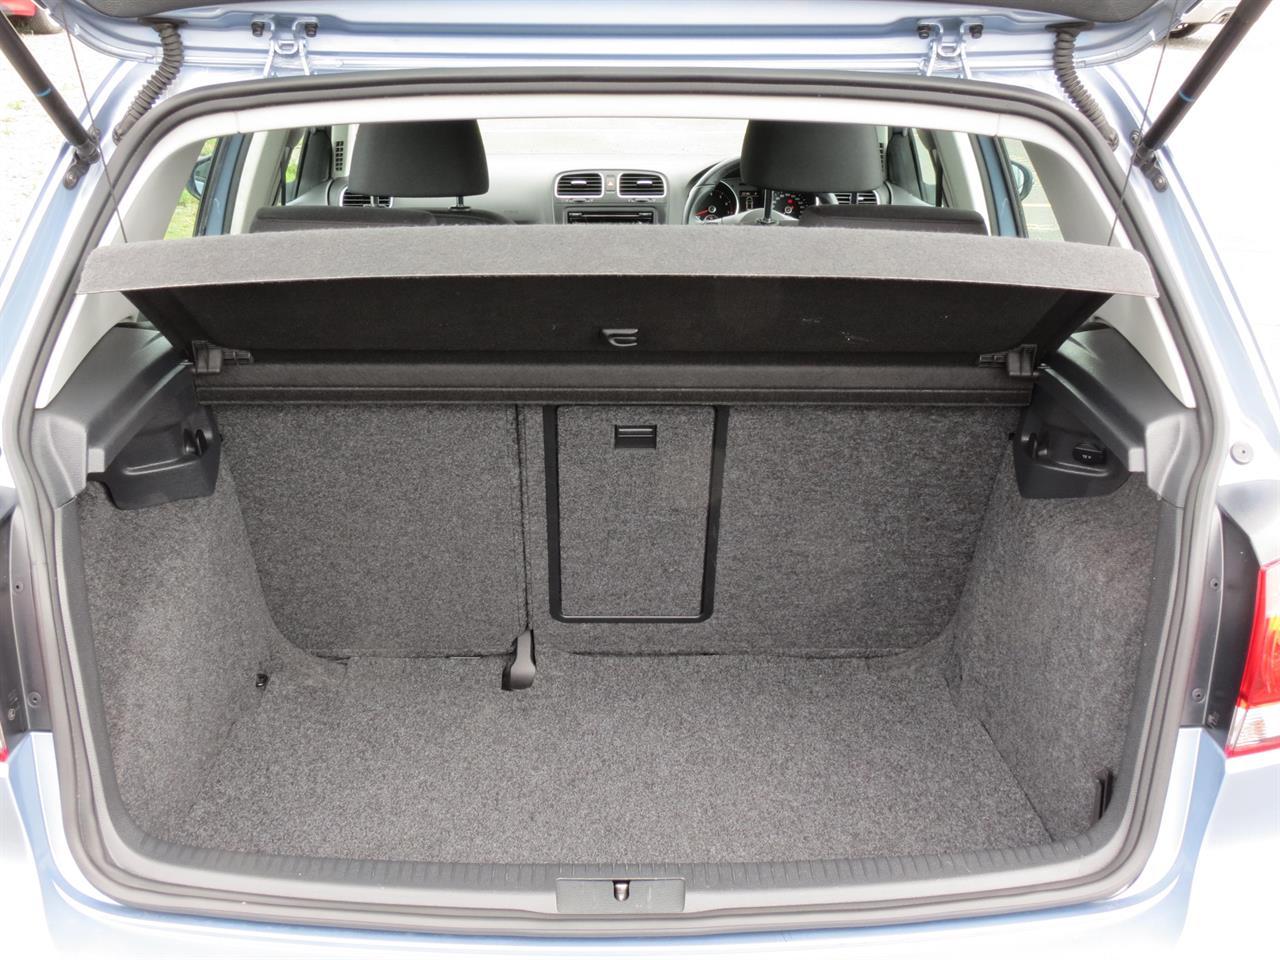 2011 Volkswagen Golf | only $42 weekly